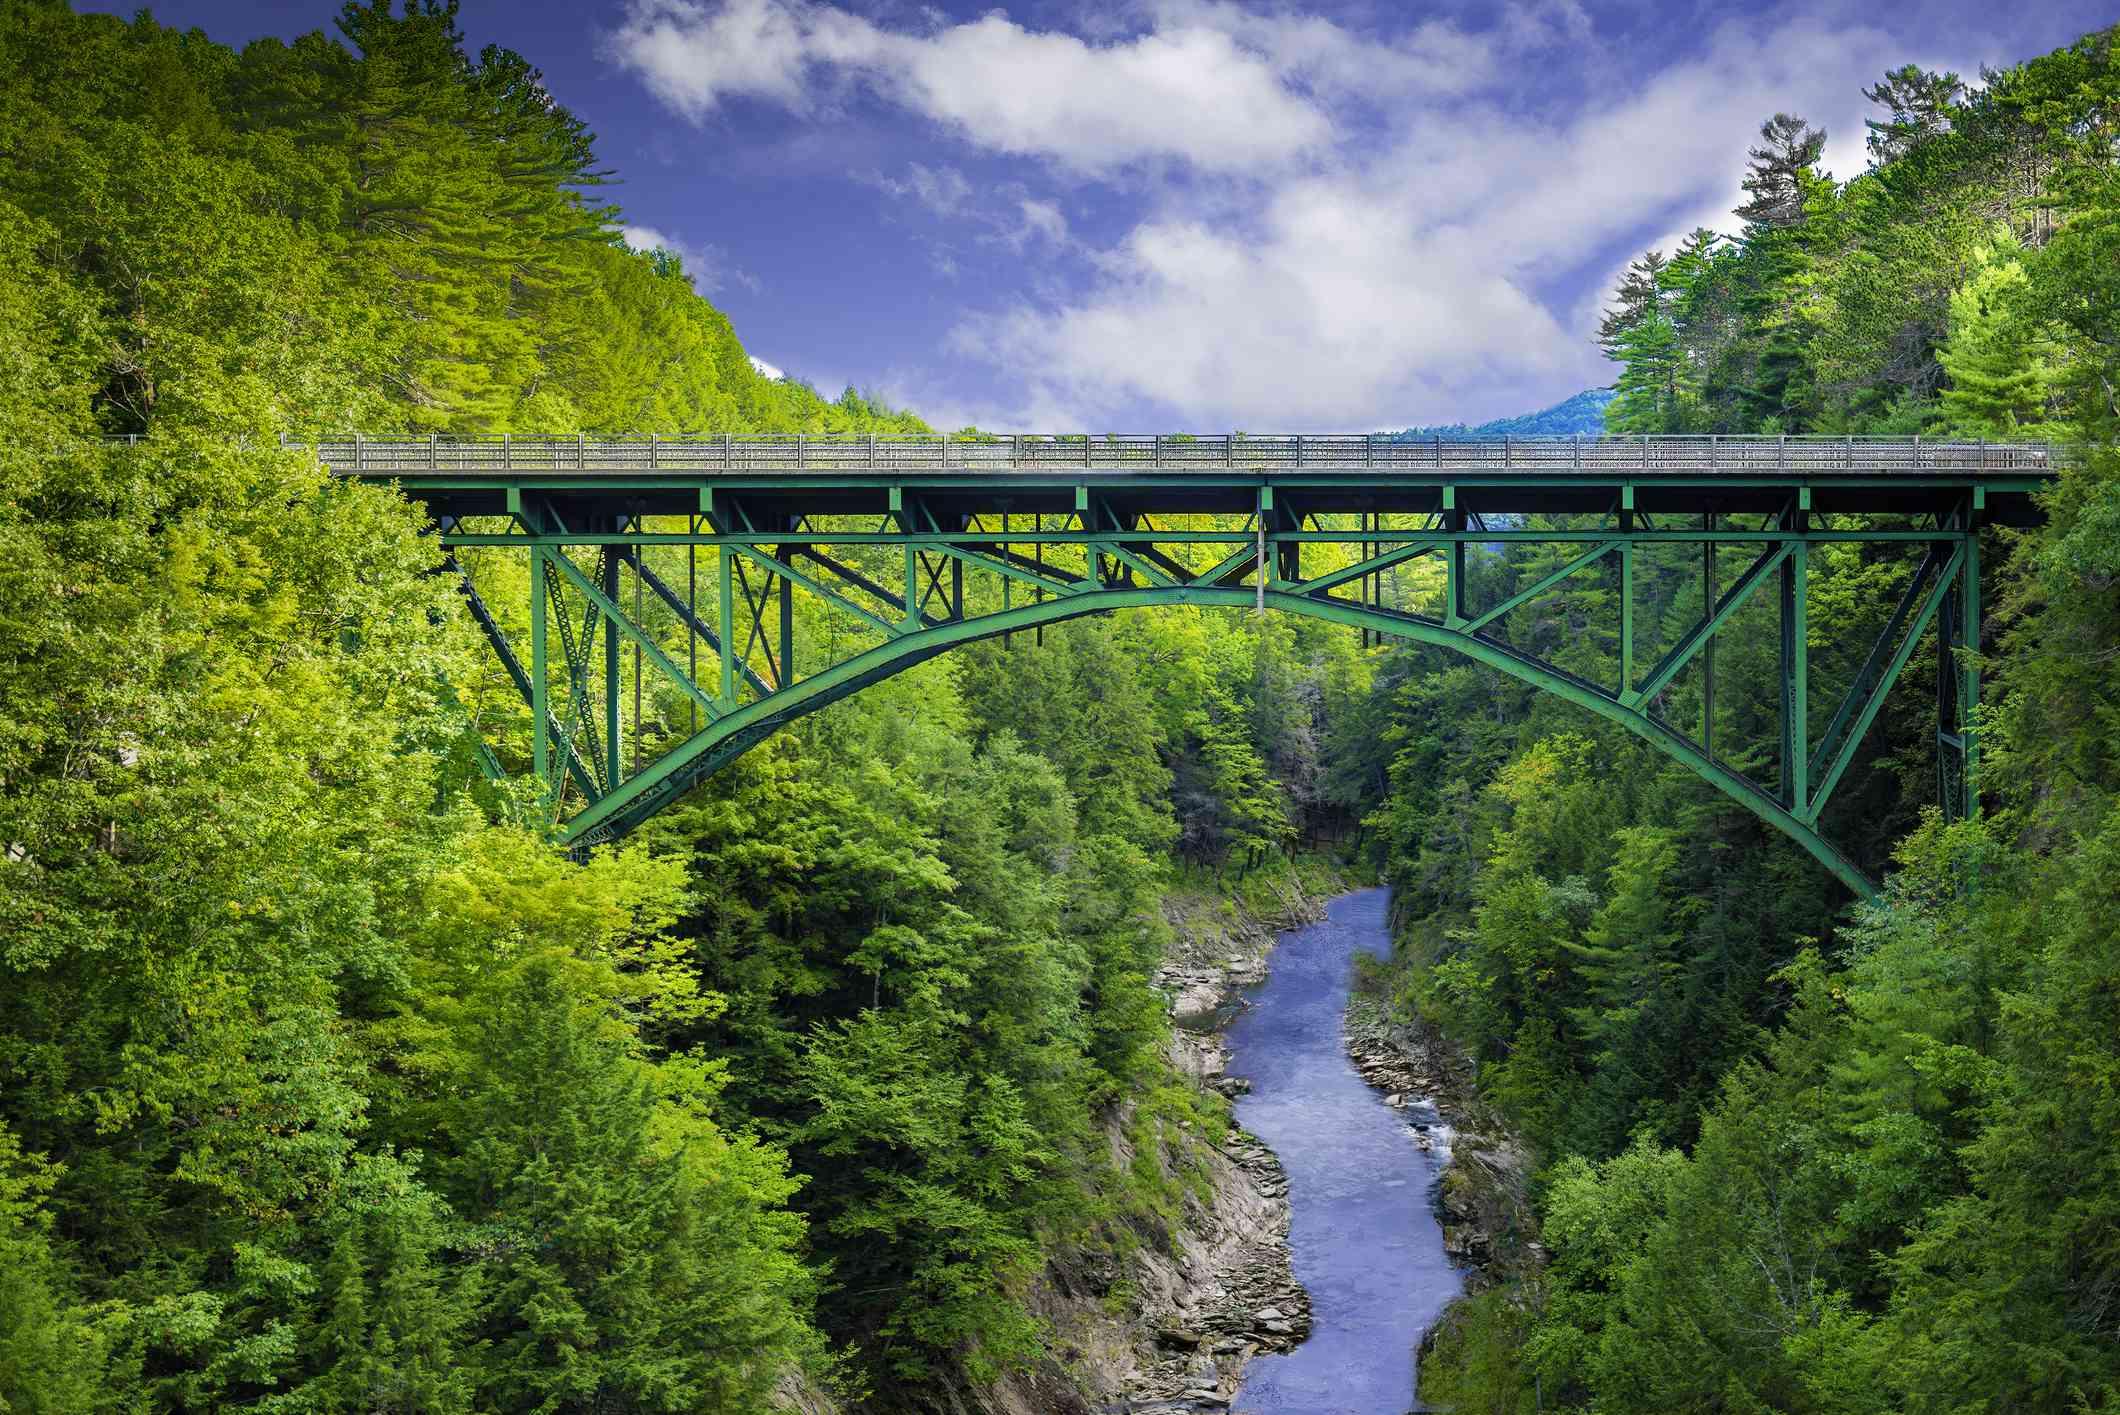 Route 4 Quechee Gorge Bridge over the Ottauquechee RIver in Vermont